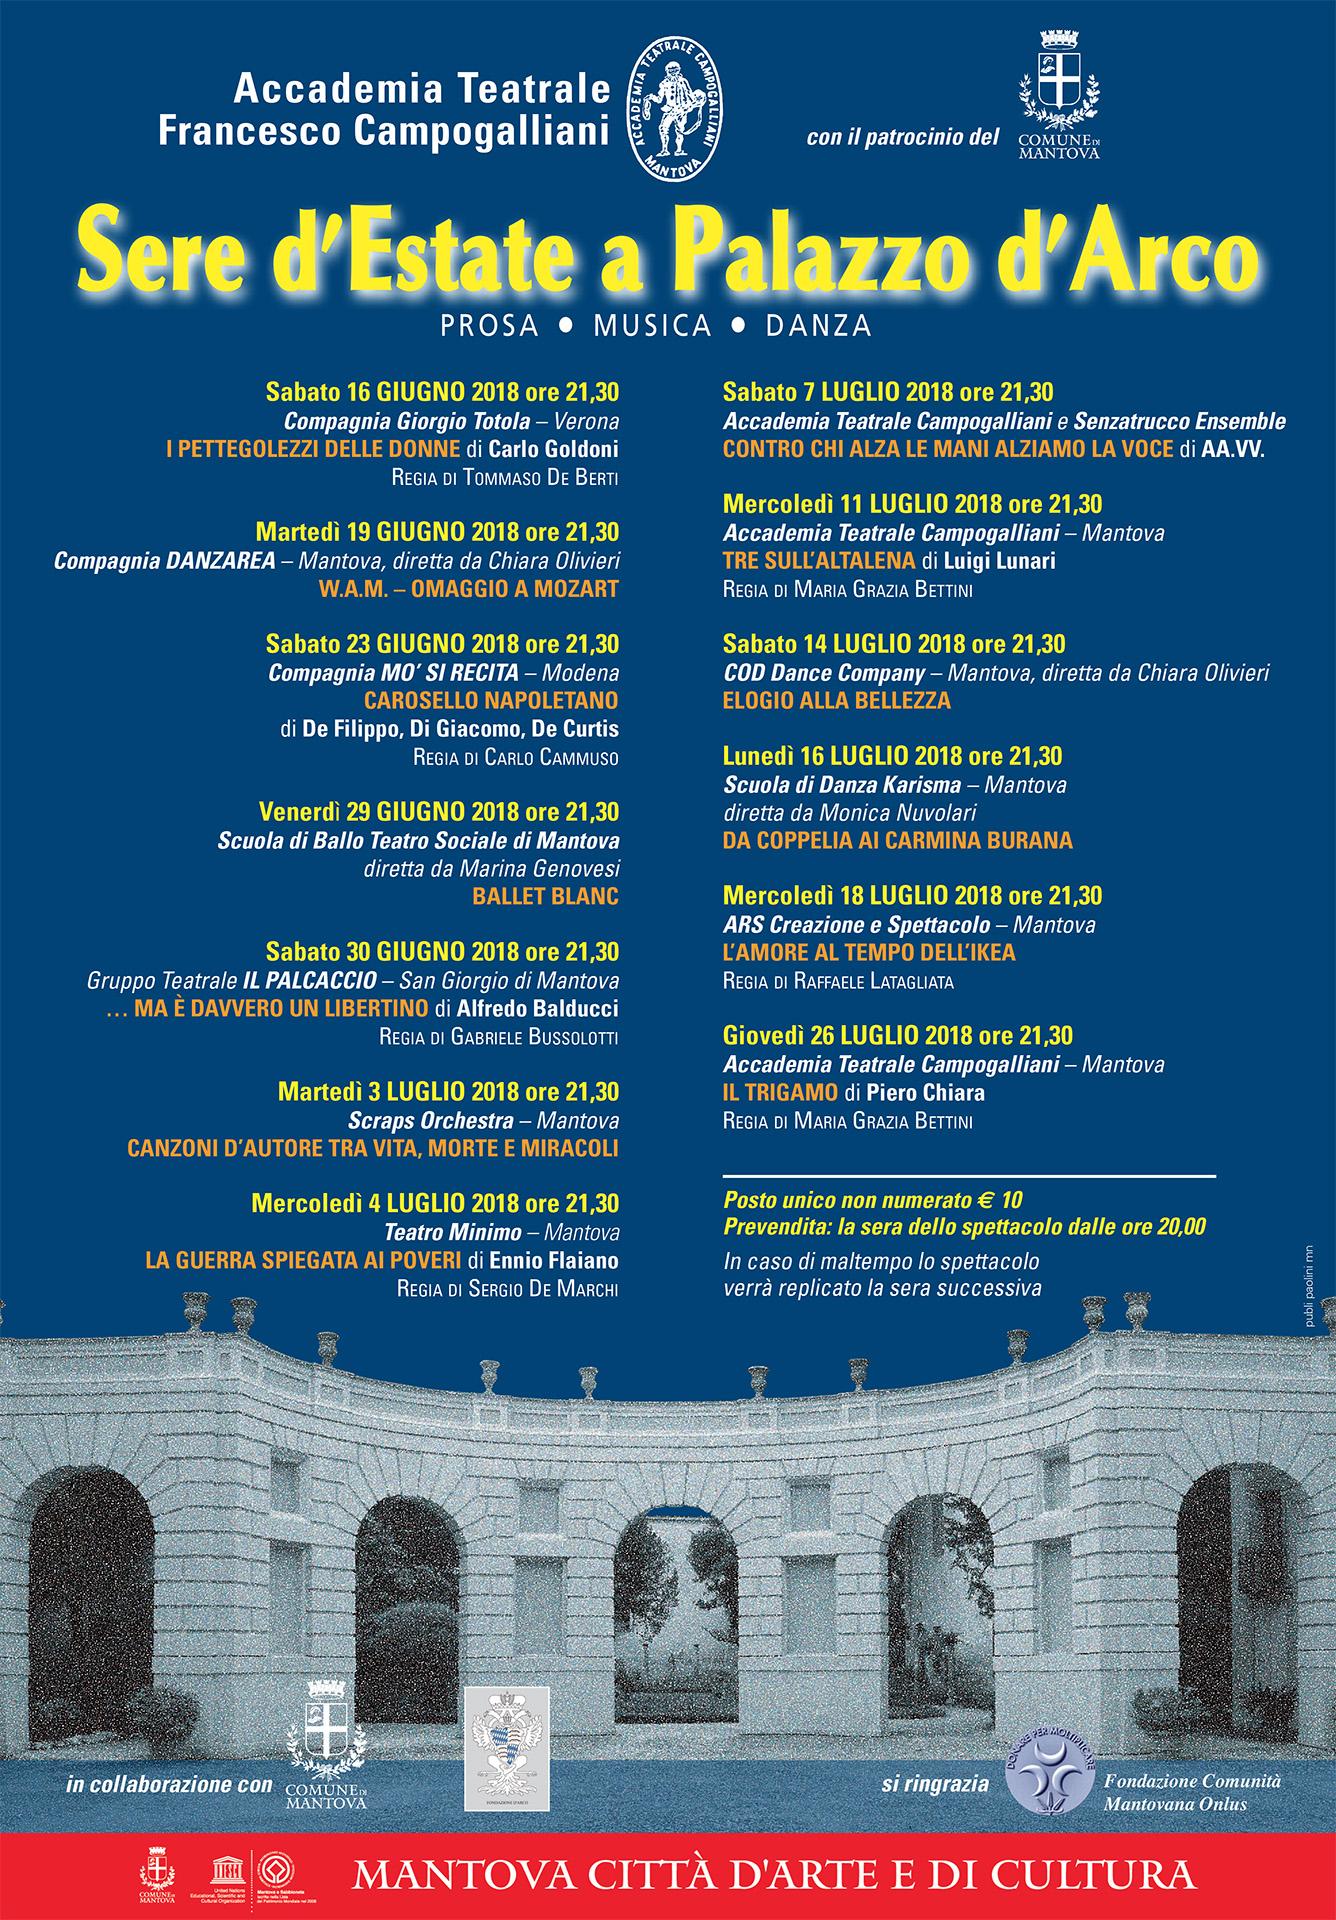 Sere d'Estate a Palazzo D'Arco